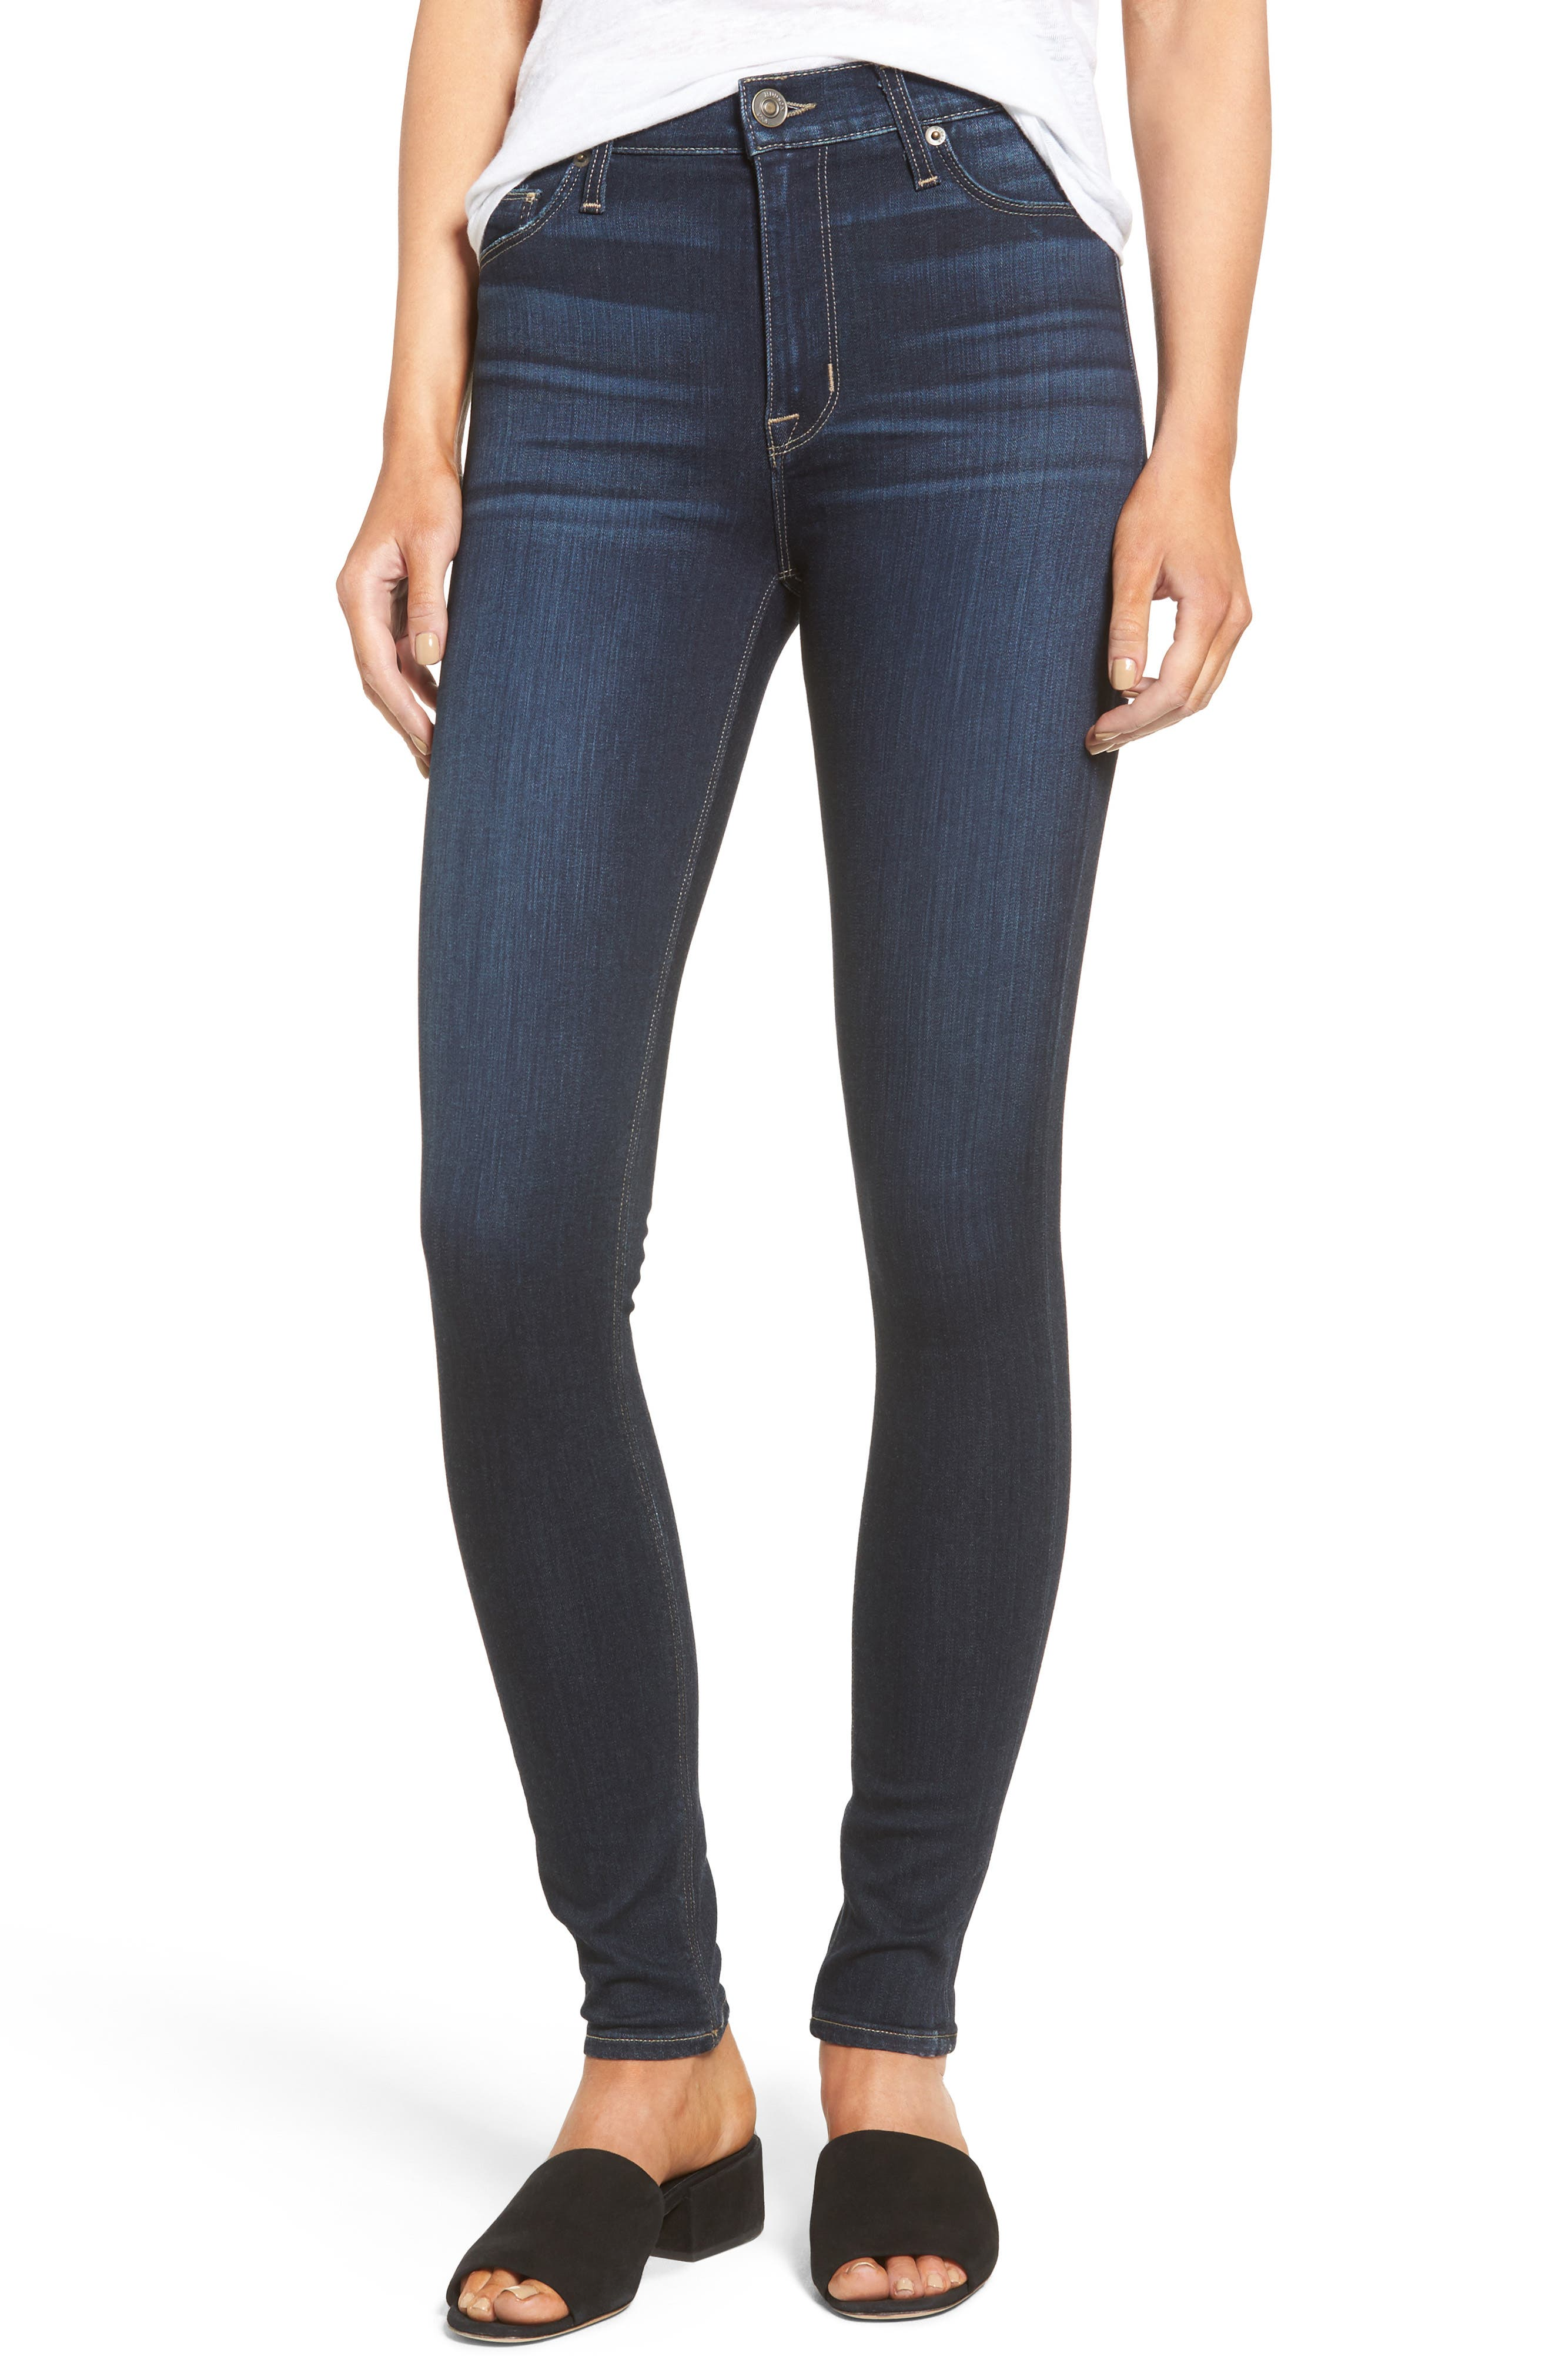 Alternate Image 1 Selected - Hudson Jeans Barbara High Waist Super Skinny Jeans (Recruit 2)